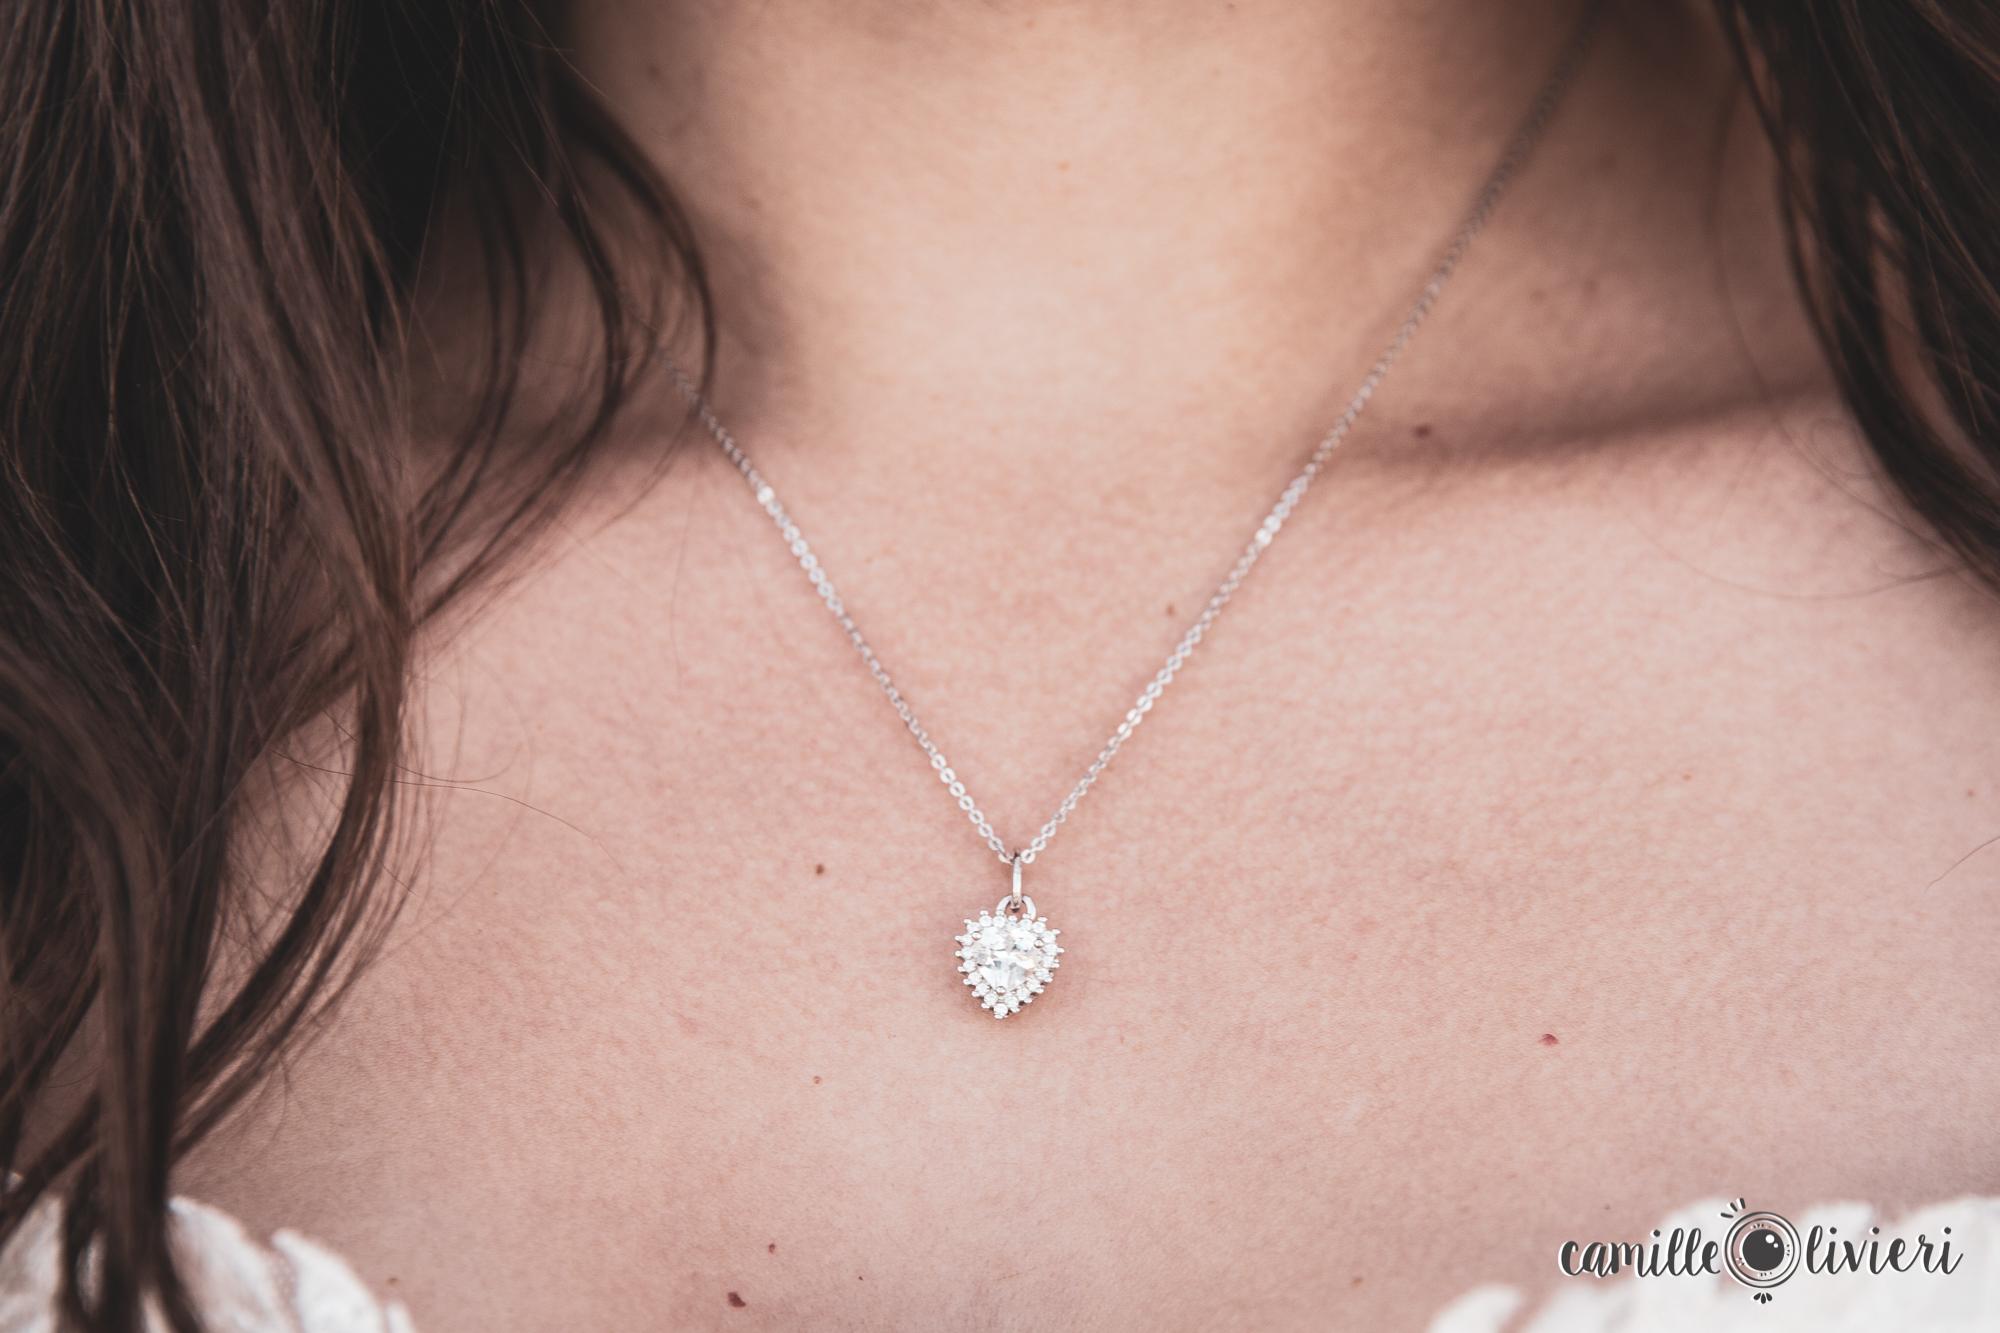 photographe_grenoble_mariage-camille-olivieri-77